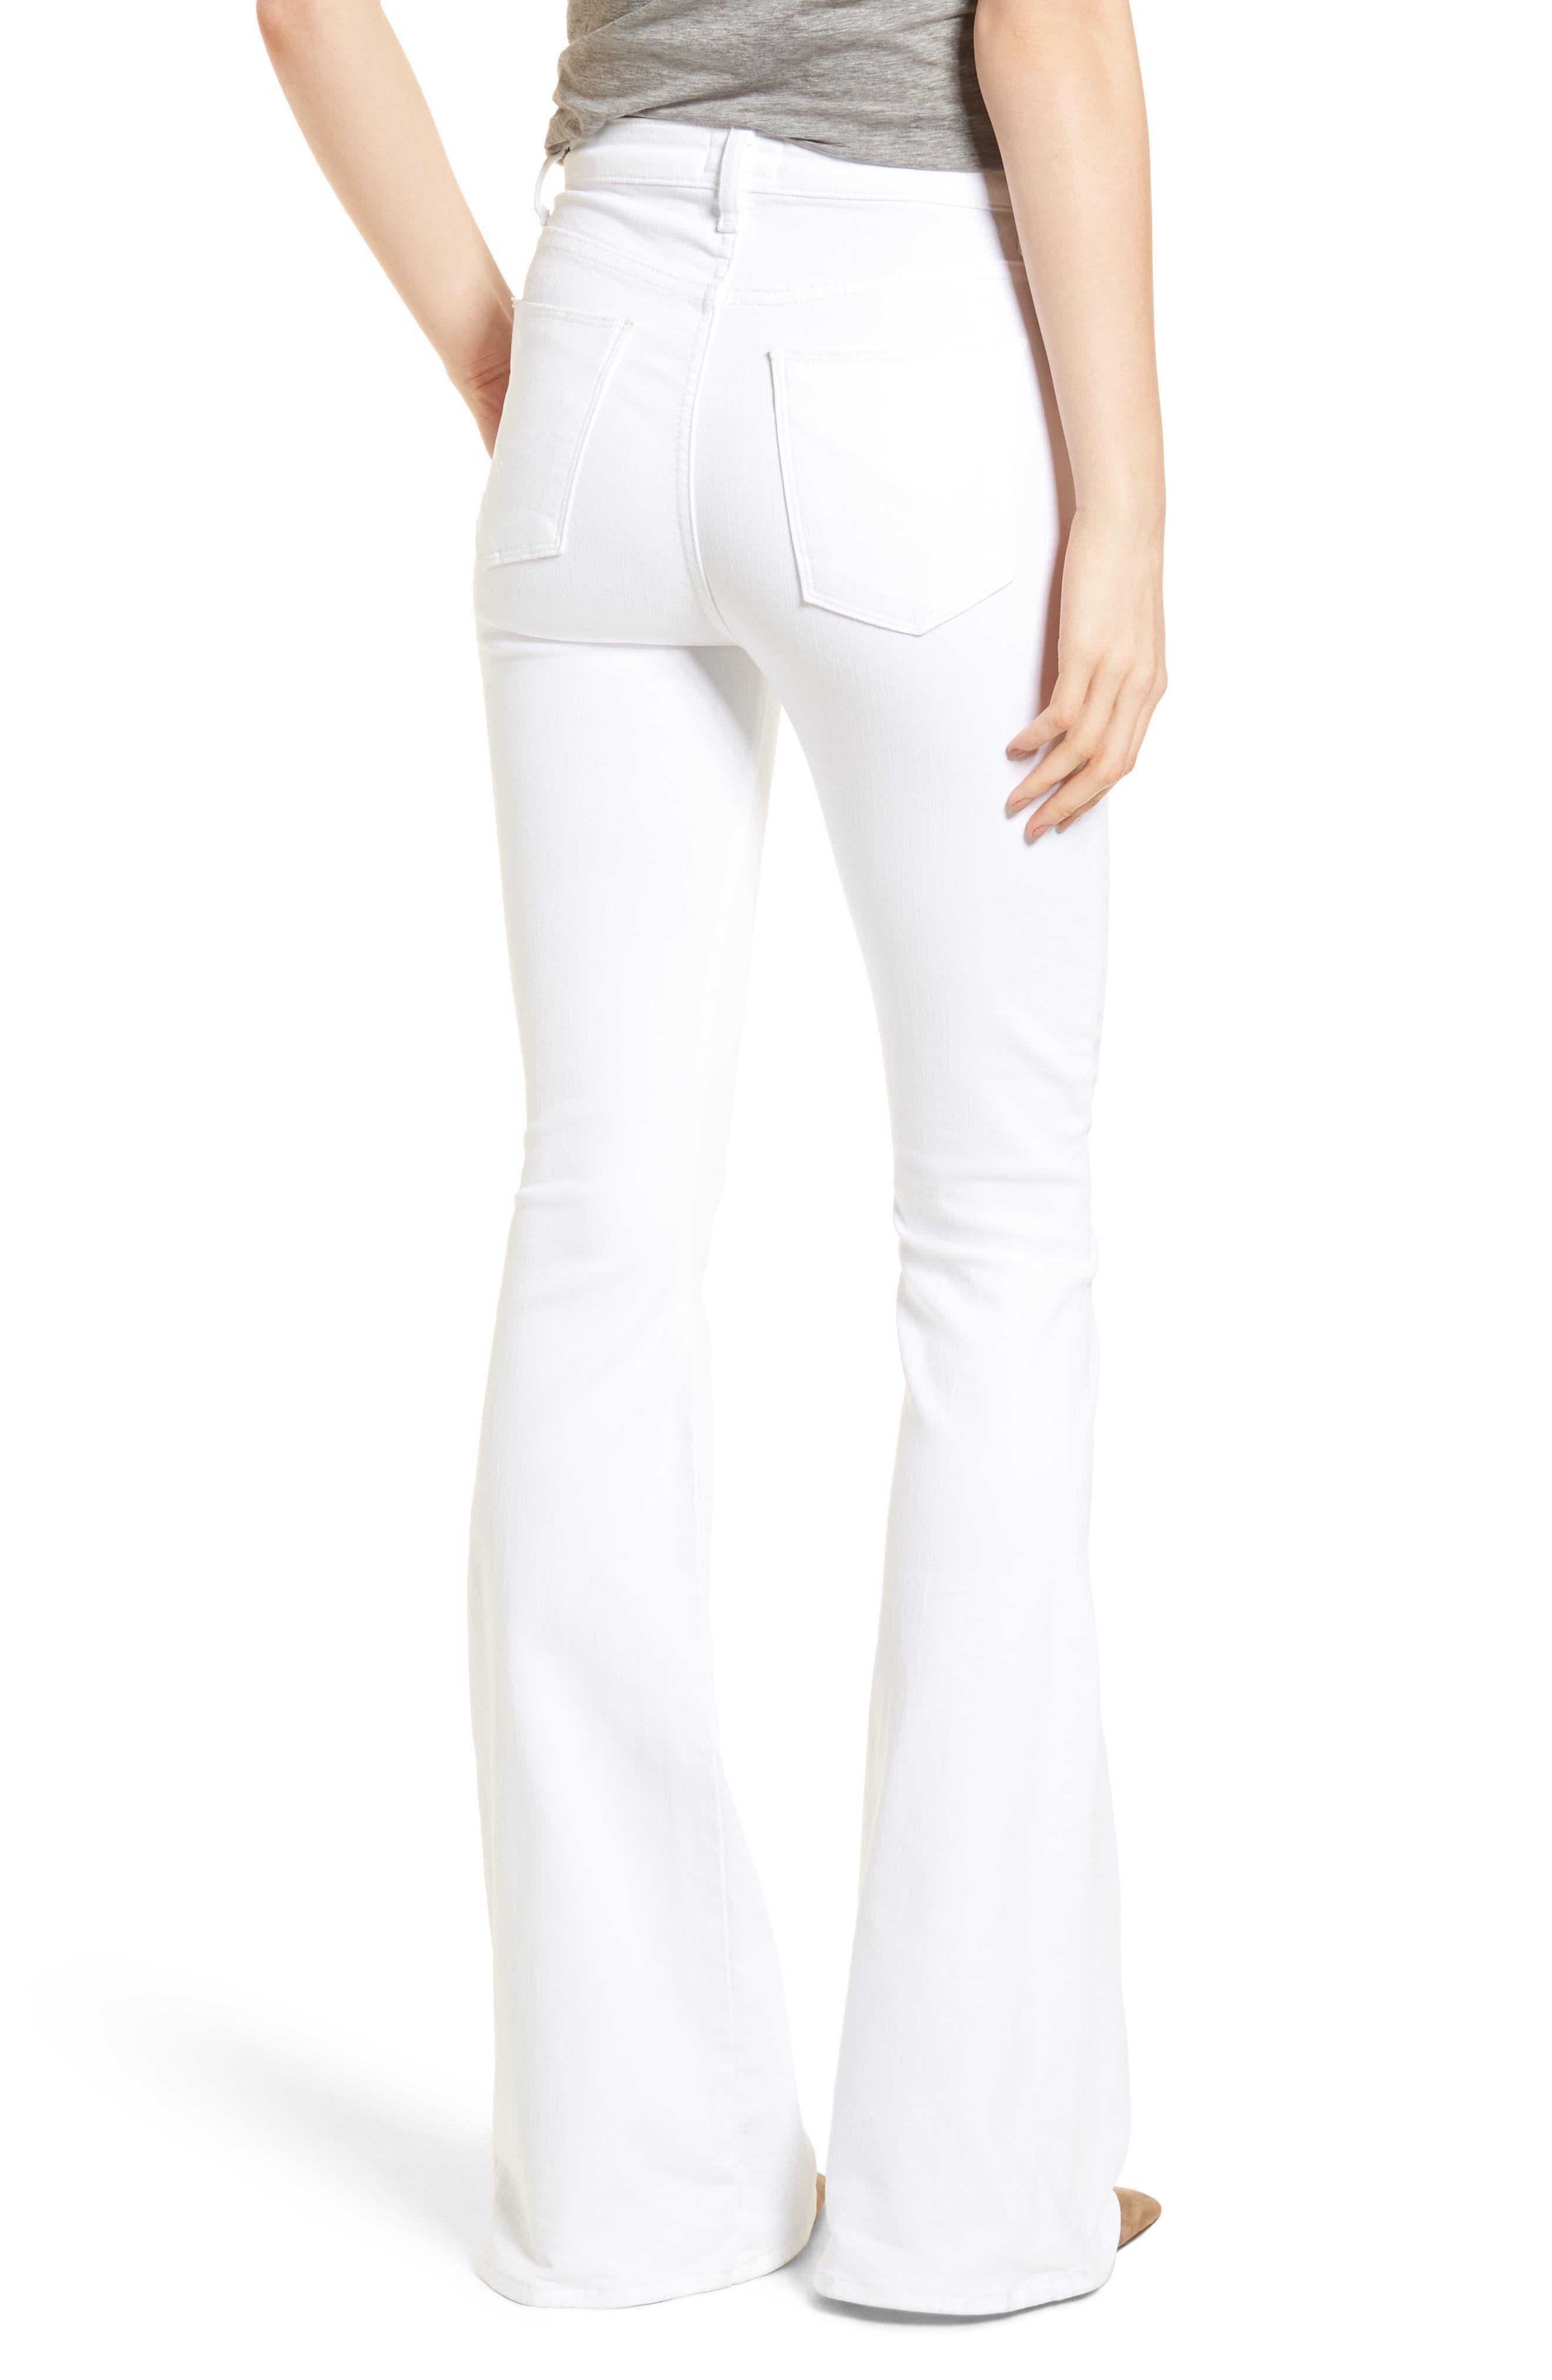 Holly High Waist Flare Jeans,                             Alternate thumbnail 2, color,                             110